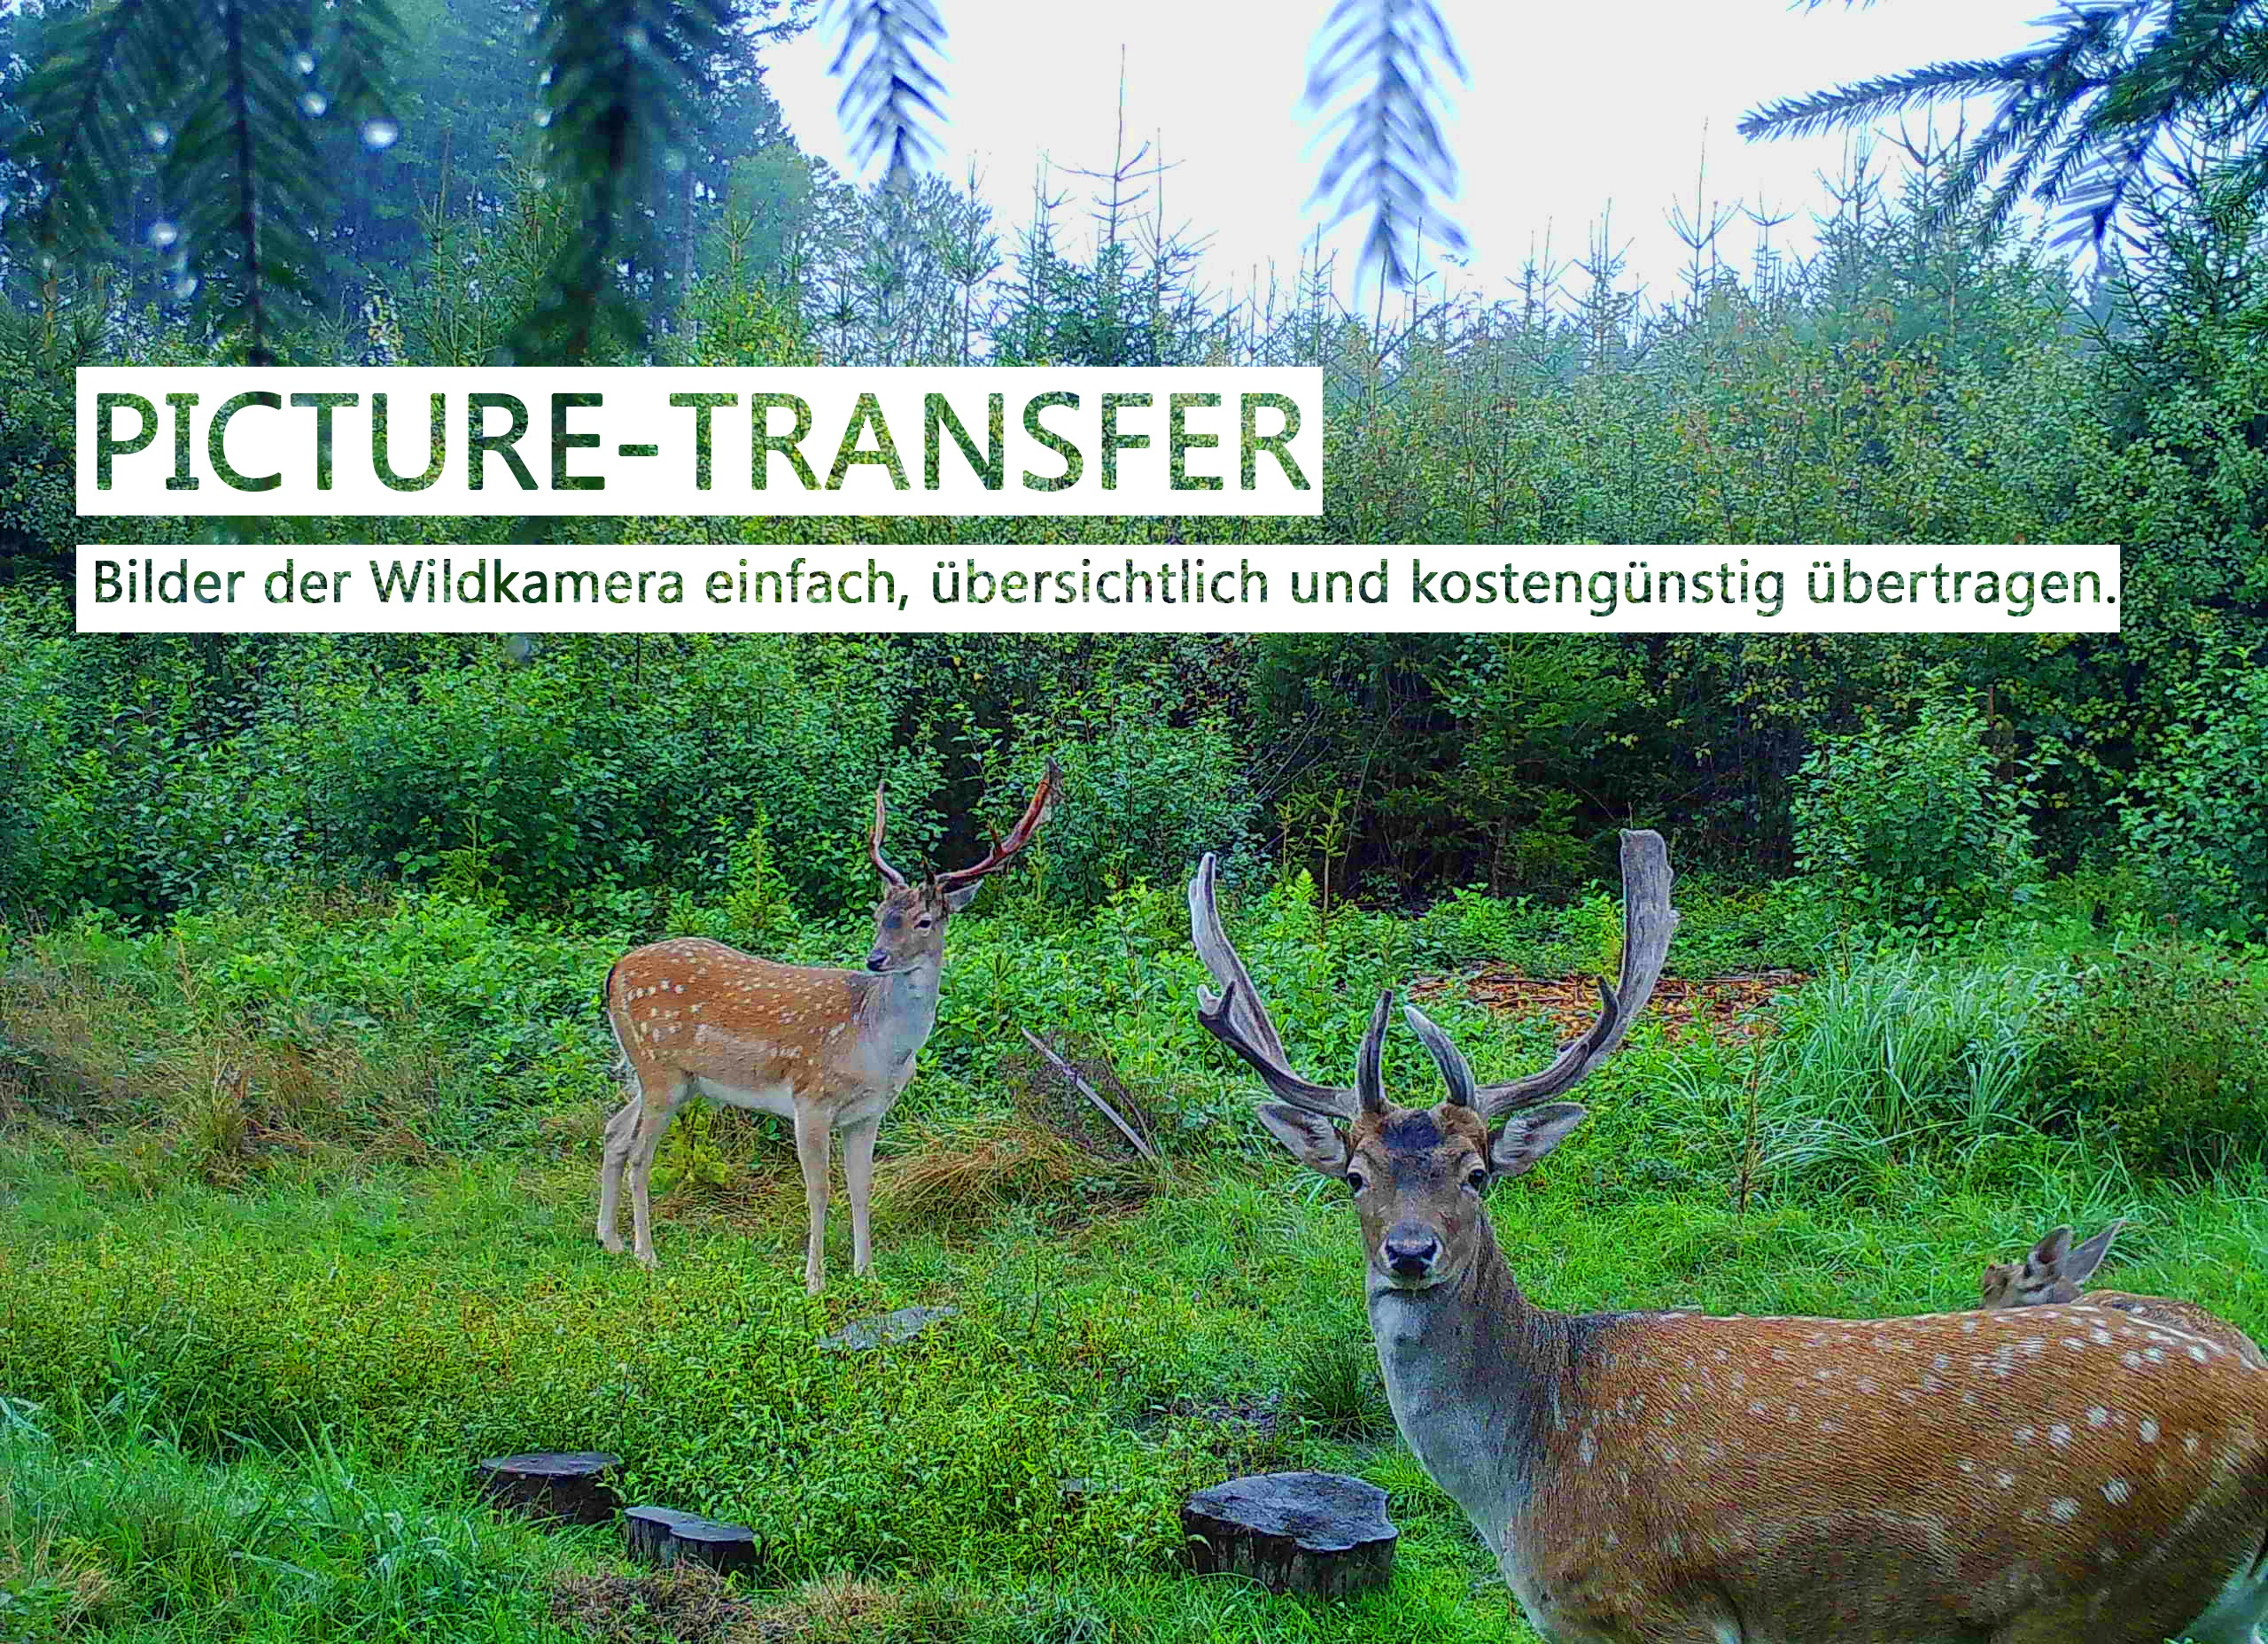 picture-transfer_V2